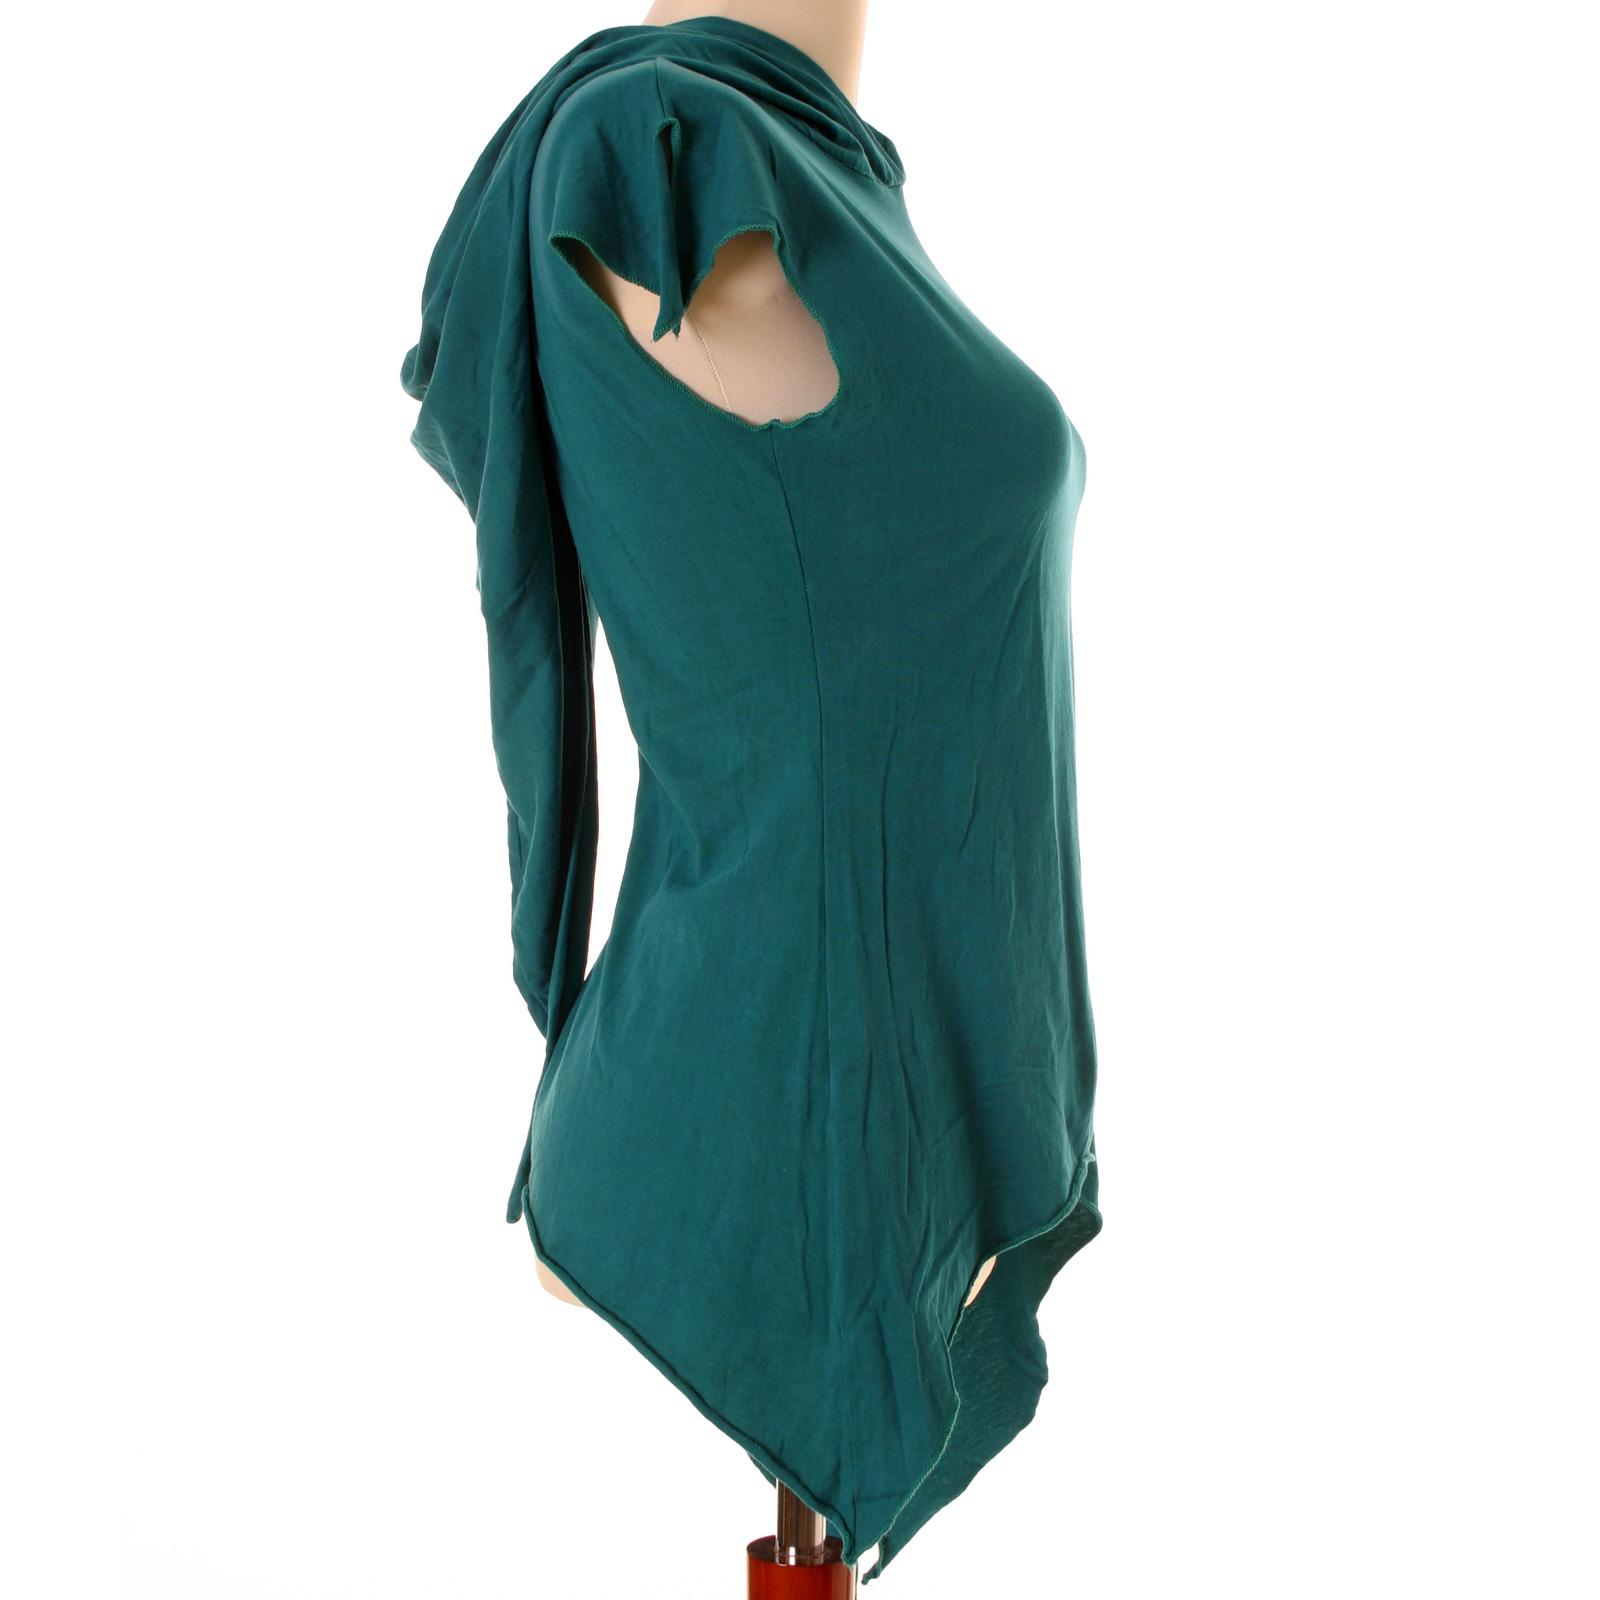 vishes Zipfelshirt Elfen Larp Zipfelkapuze Lagenlook Hippie Pixie Shirt Tunika